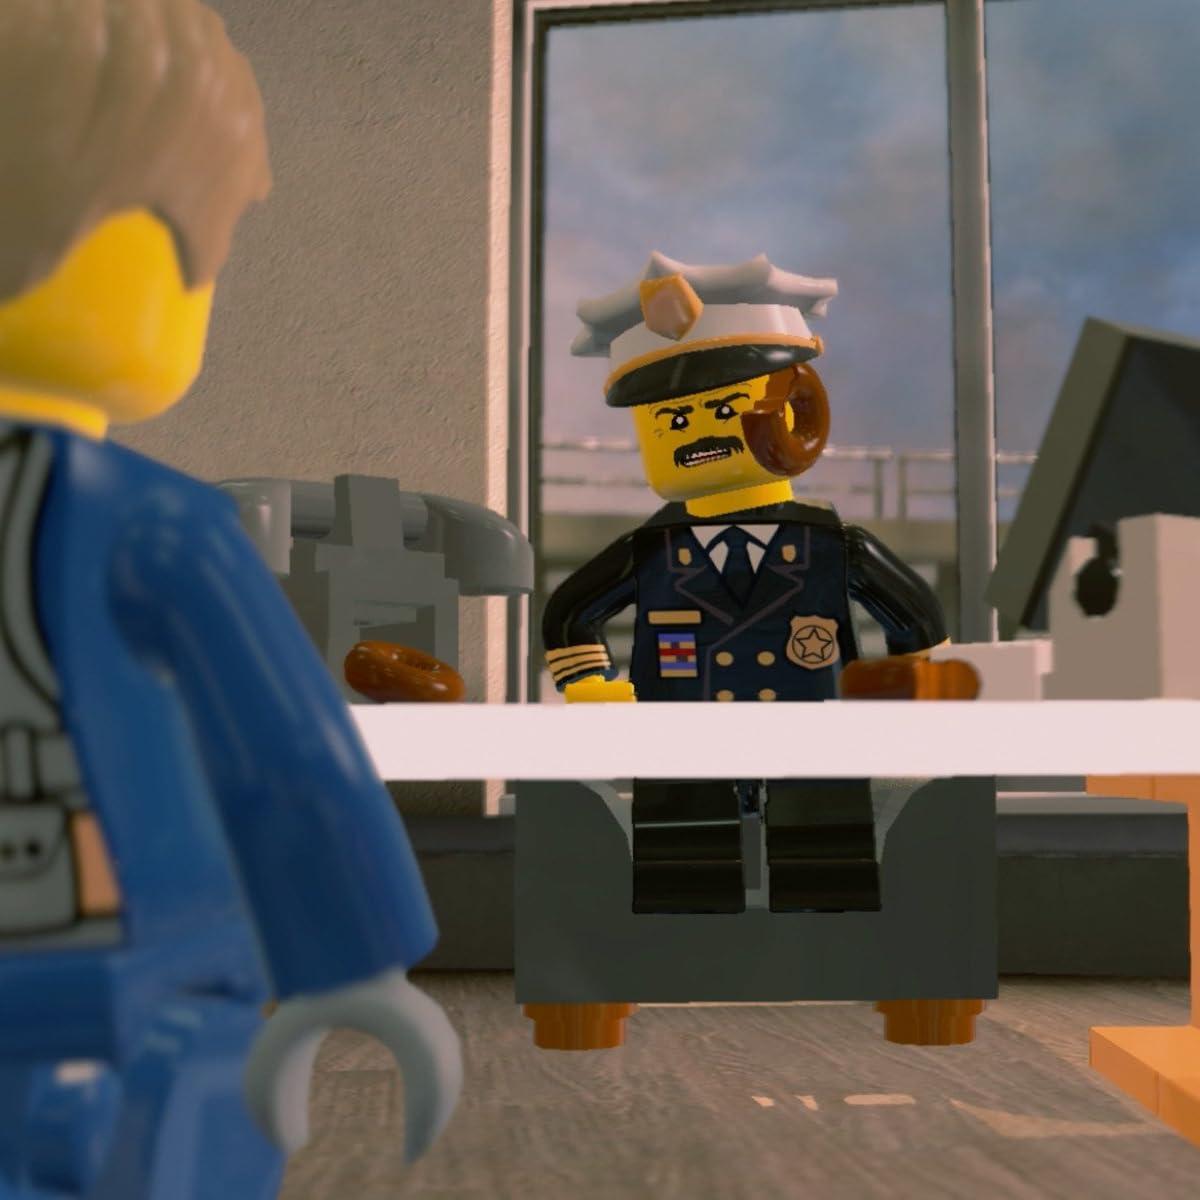 Lego レゴ Ipad壁紙 The Legend Of Rex Fury その他 スマホ用画像136534